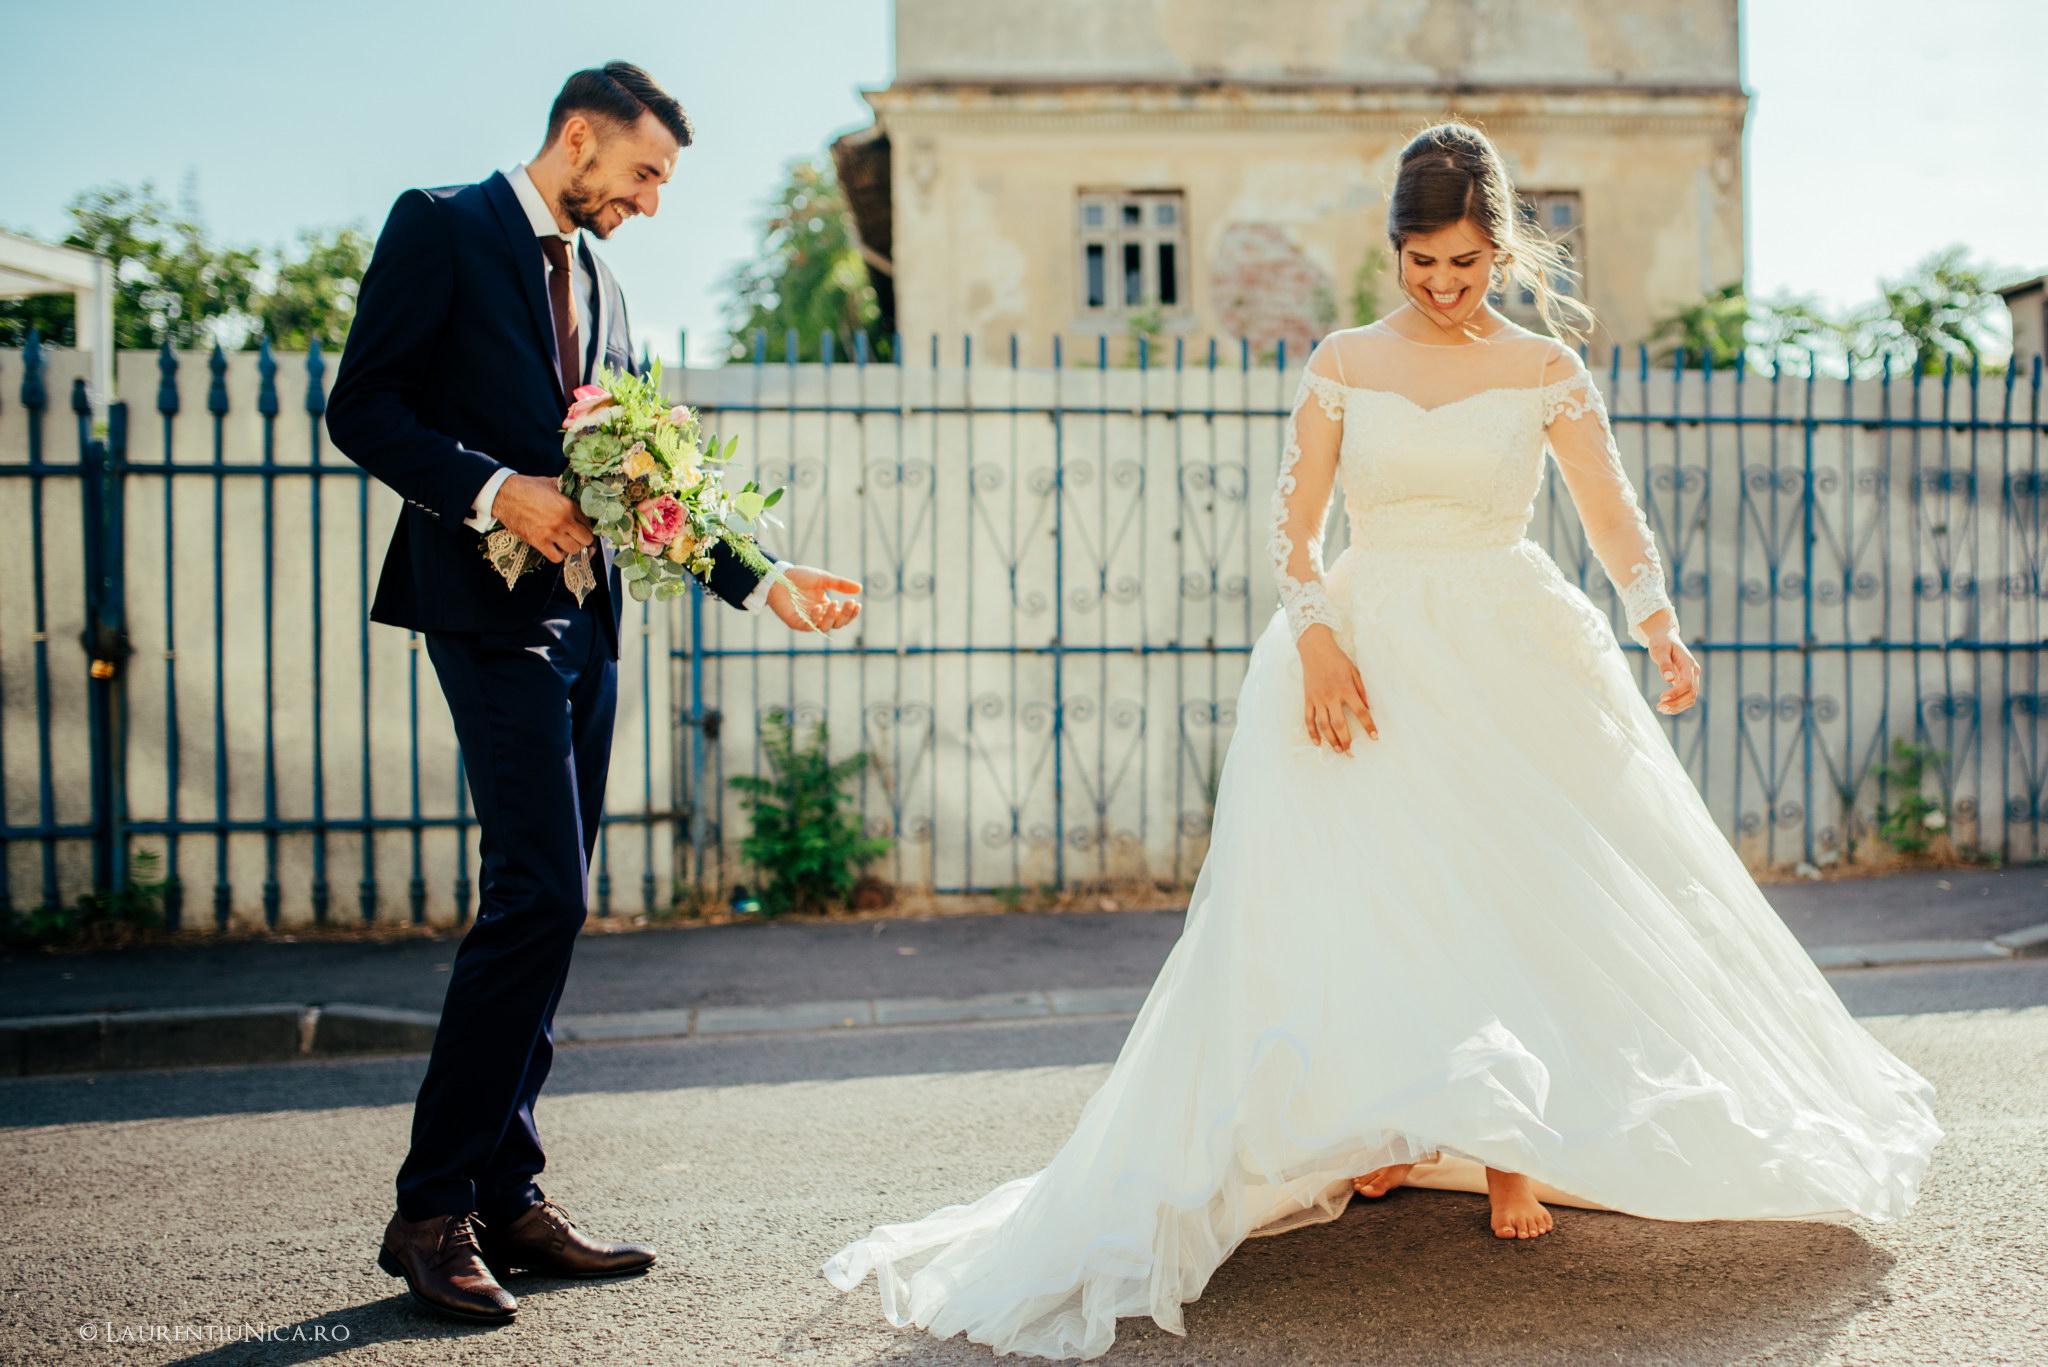 Alina si Andrei fotograf nunta laurentiu nica craiova 32 - Alina & Andrei | Fotografii nunta